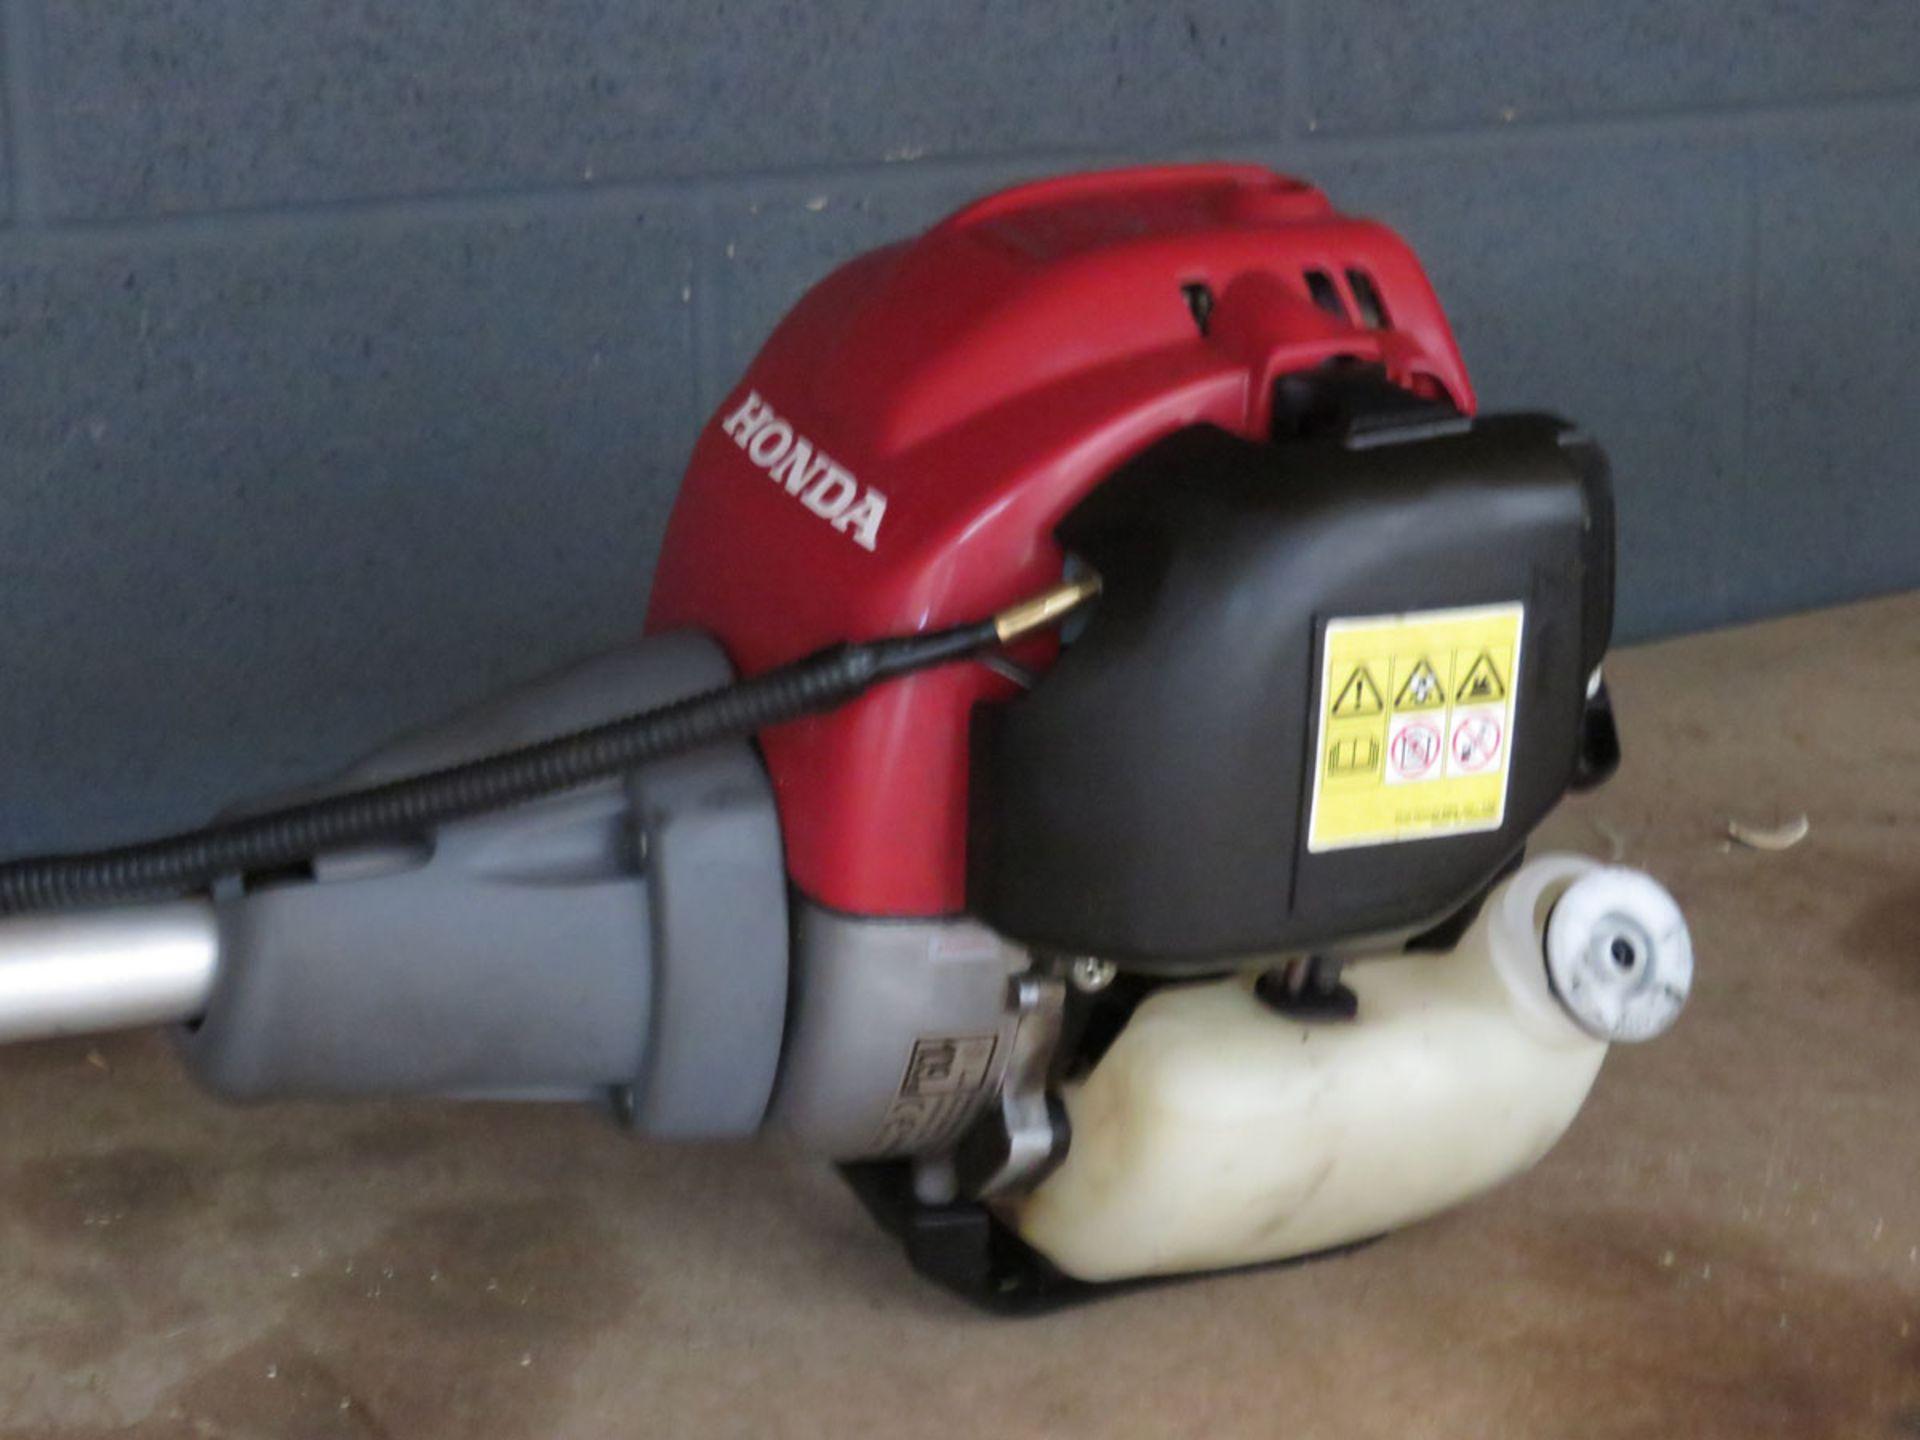 Honda petrol powered brushcutter - Image 2 of 2